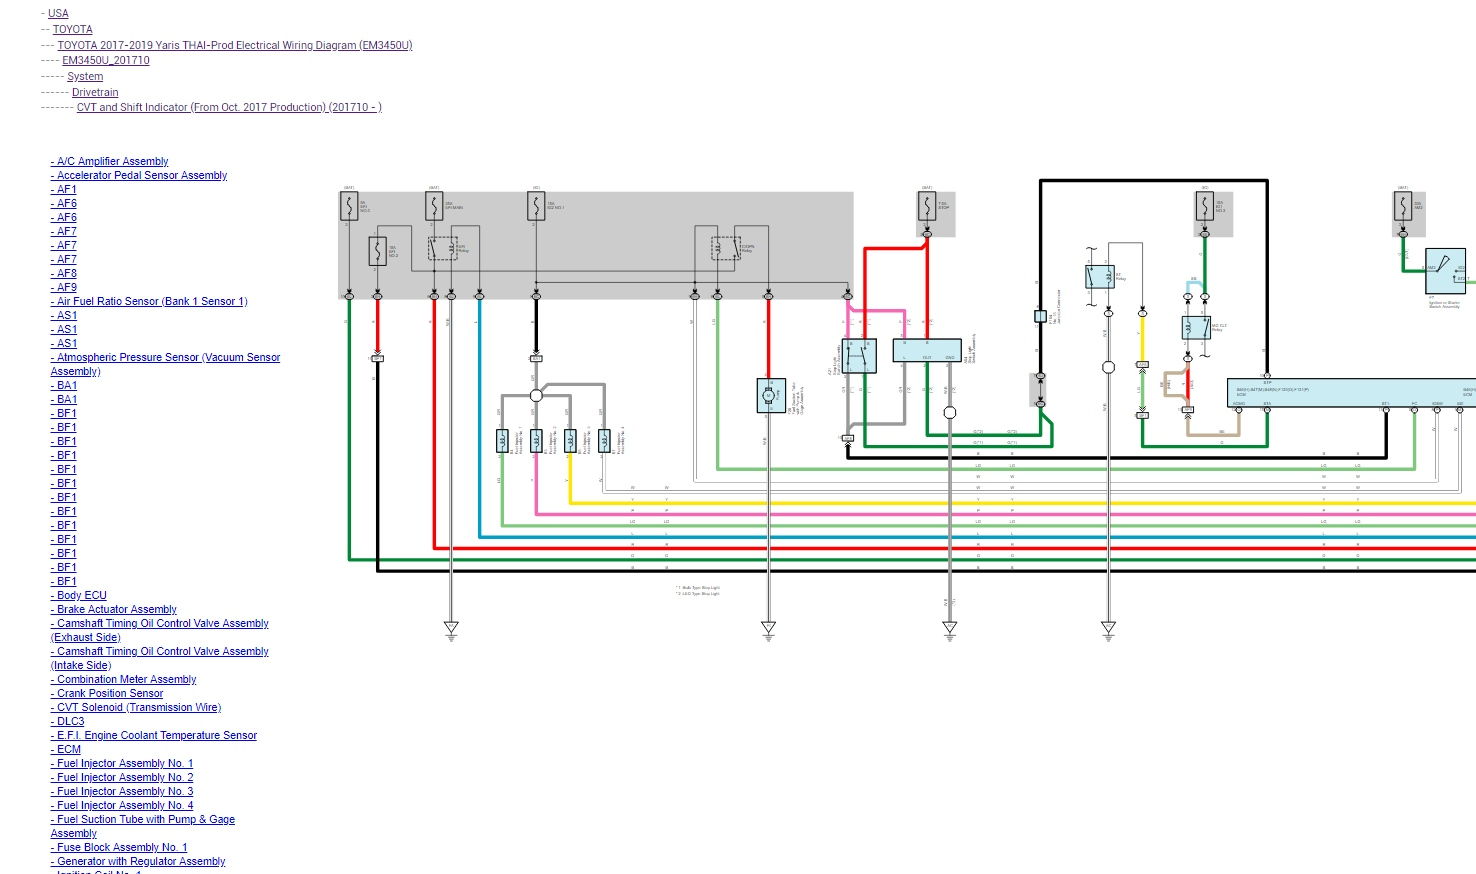 2007 Toyota Sienna Wiring Diagram from img.autorepairmanuals.ws